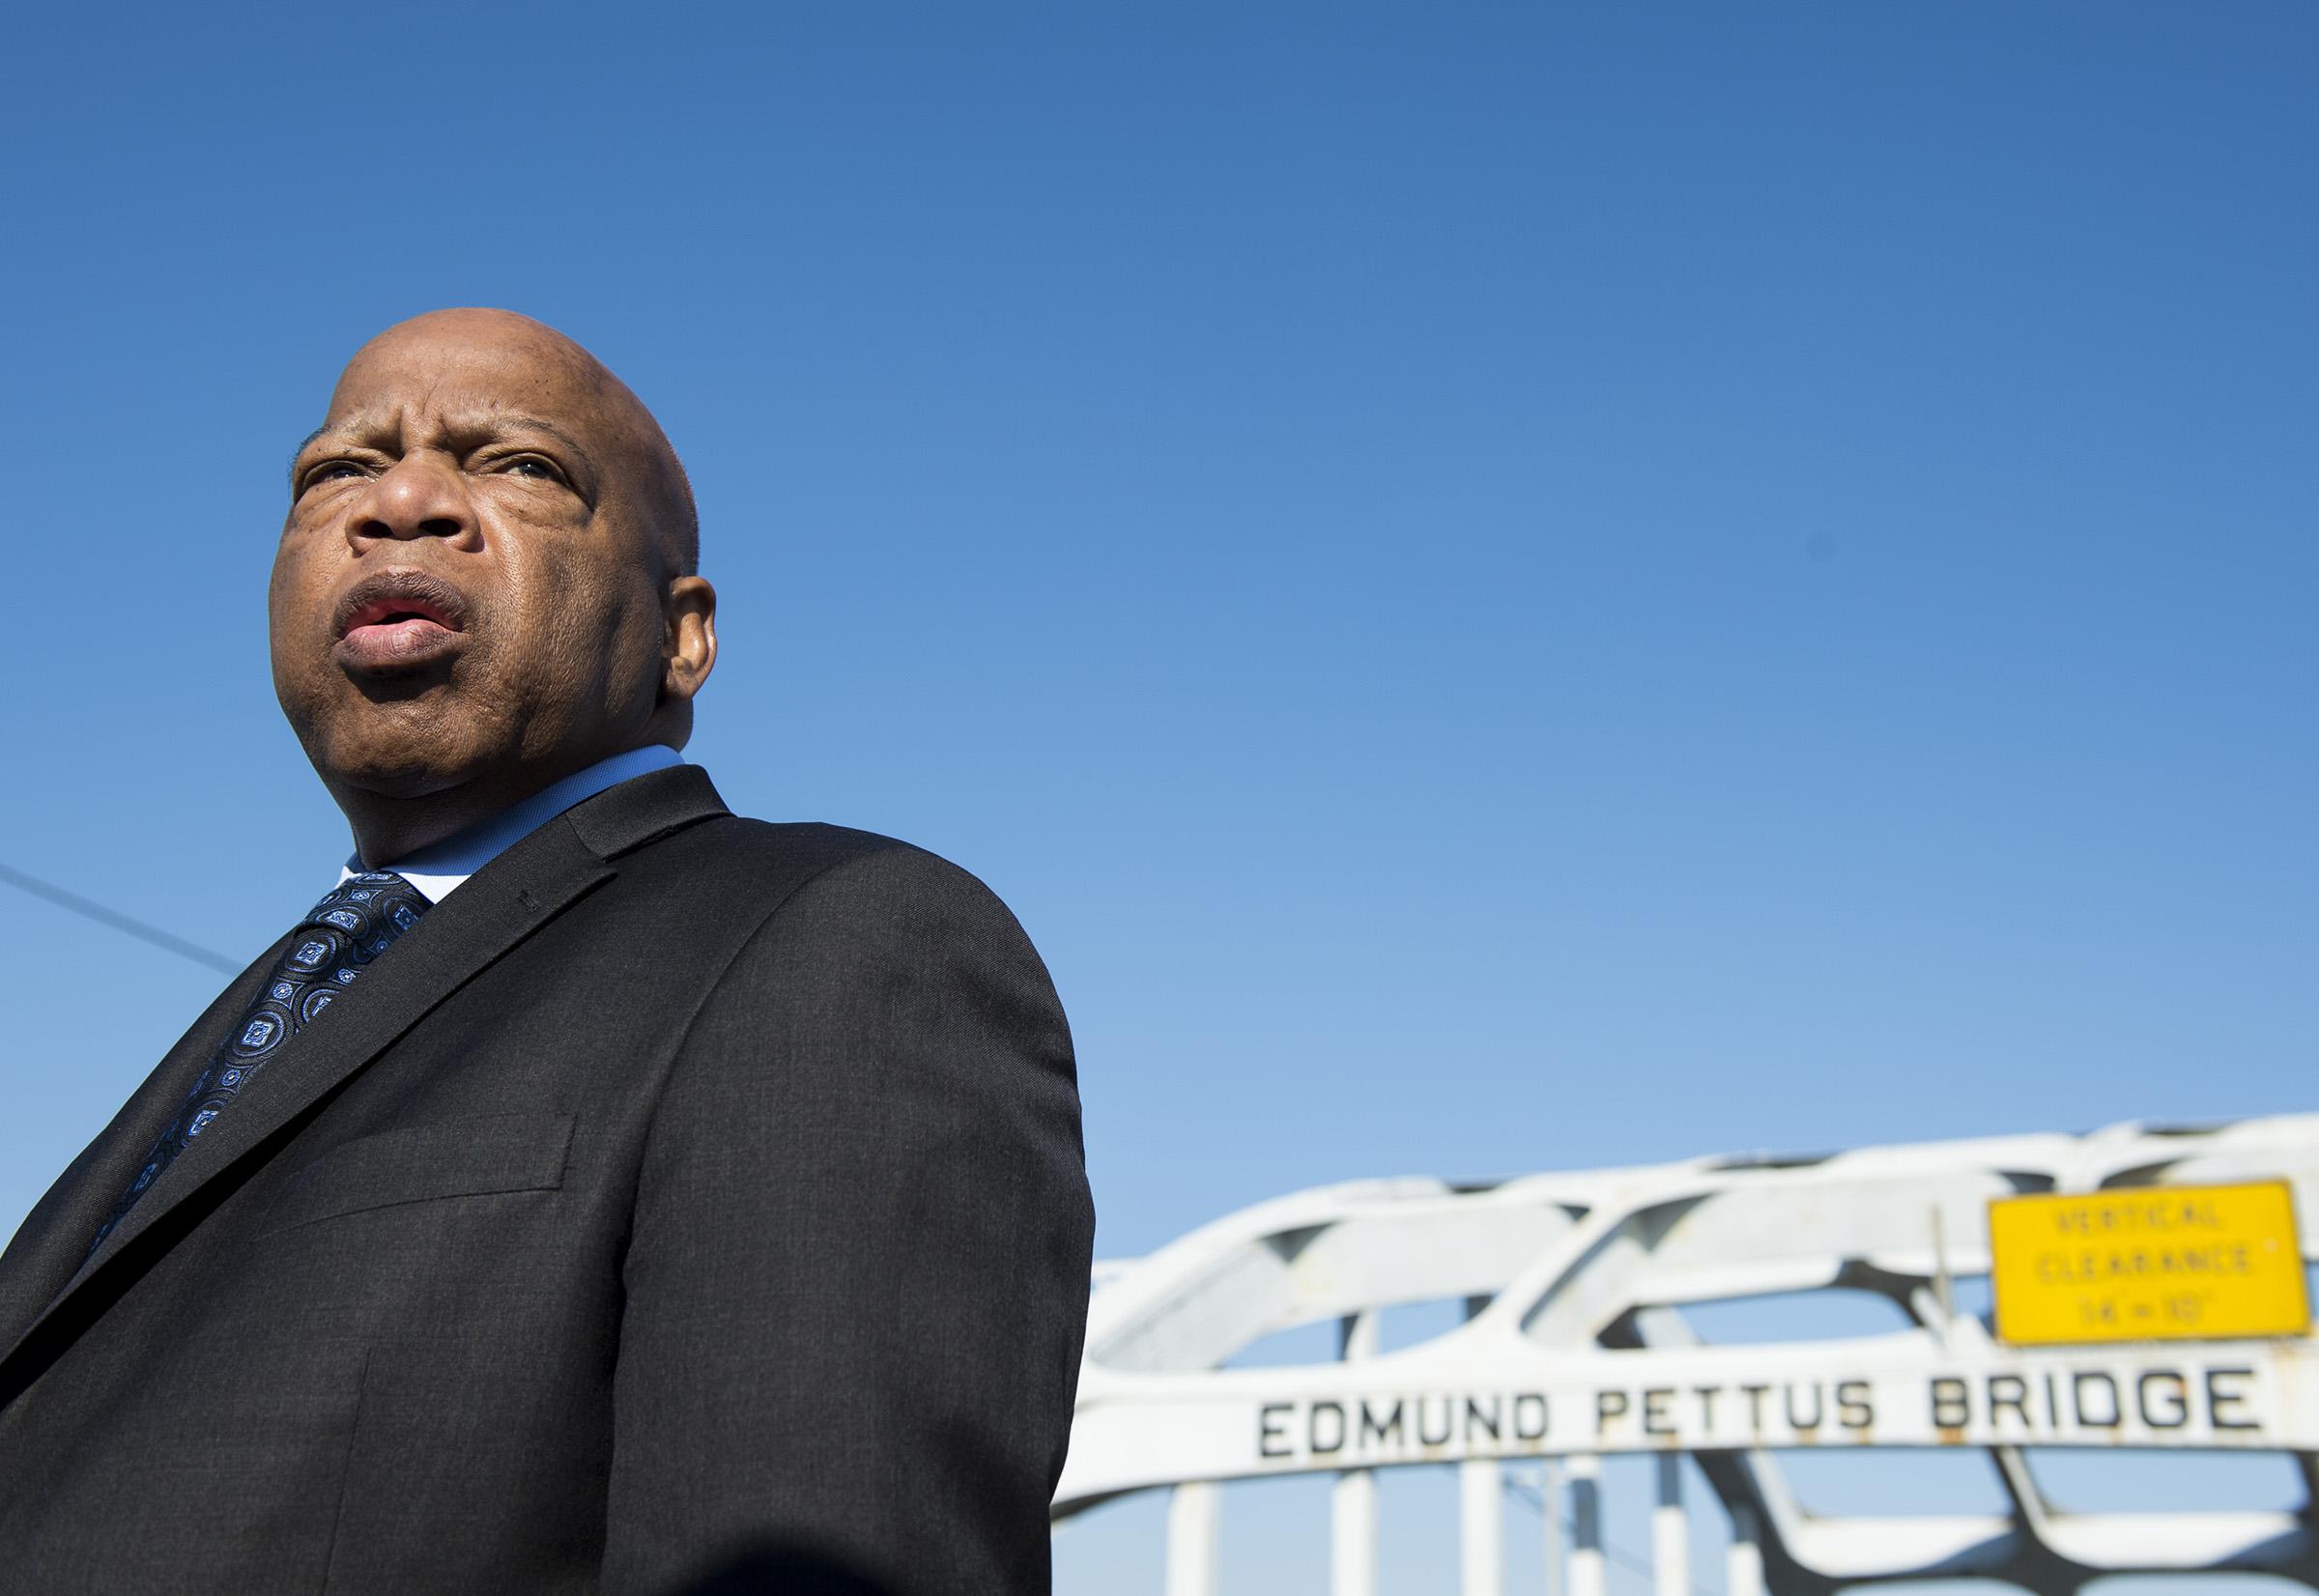 Rep. John Lewis, D-Ga., stands on the Edmund Pettus Bridge in Selma, Ala., on Feb. 14, 2015.